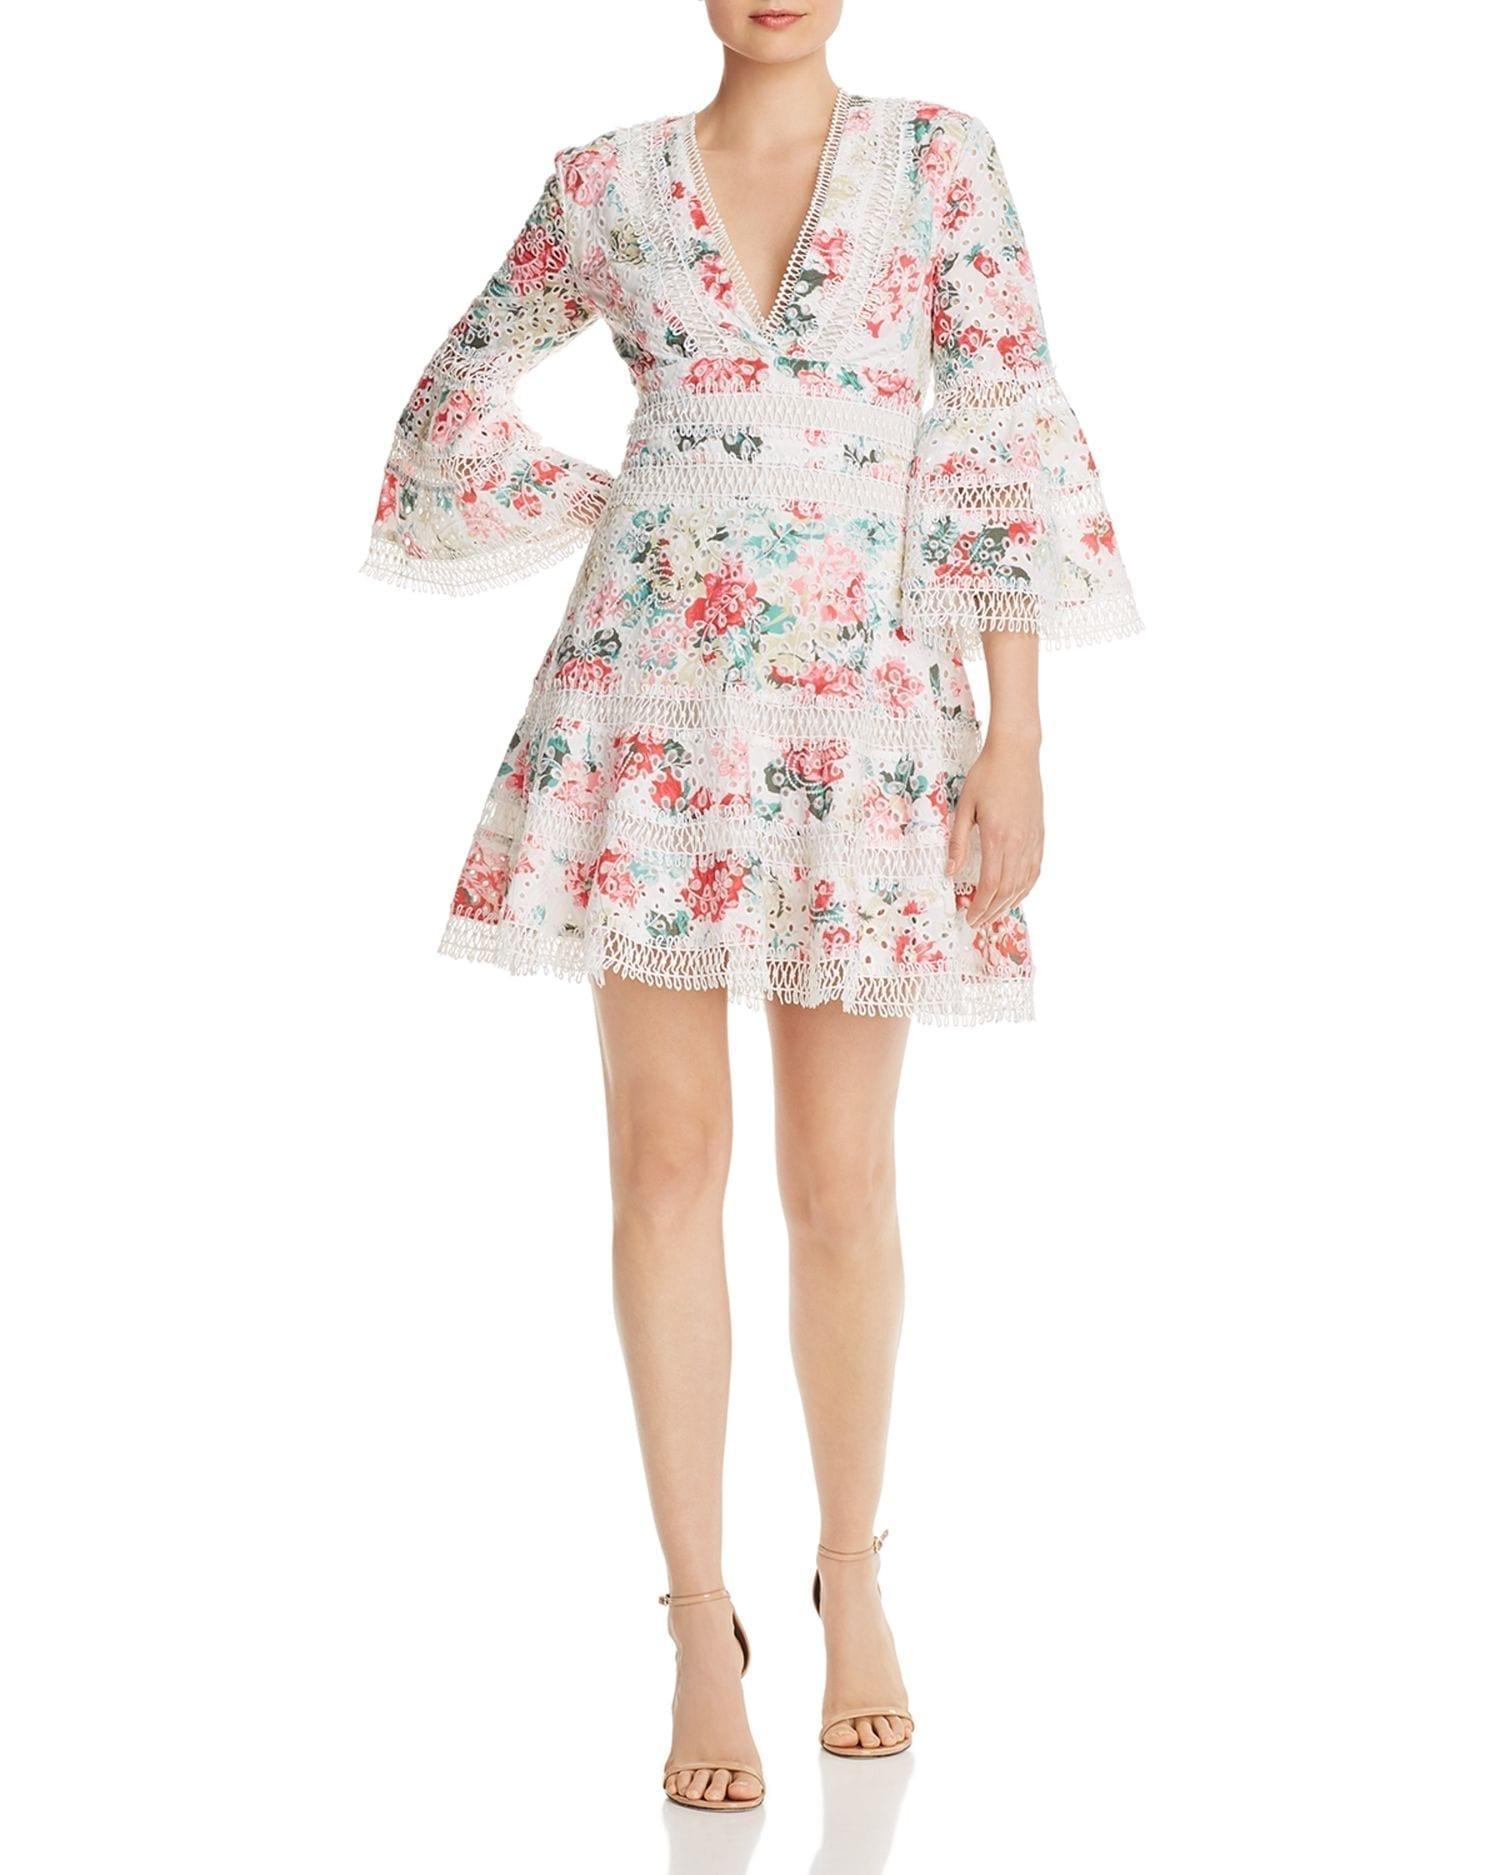 AQUA Floral Eyelet & Lace Dress